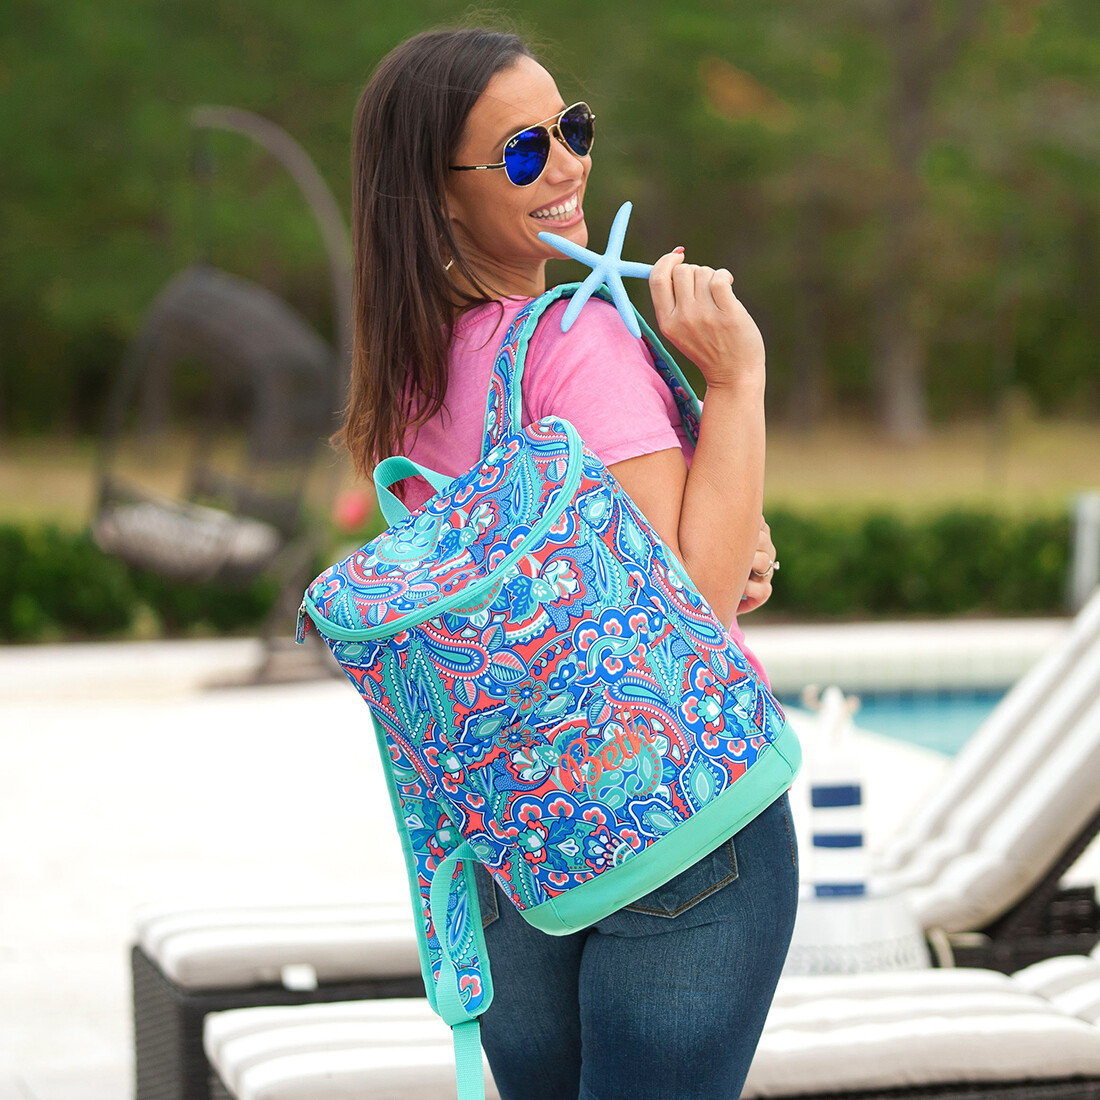 Island Bliss Backpack Cooler